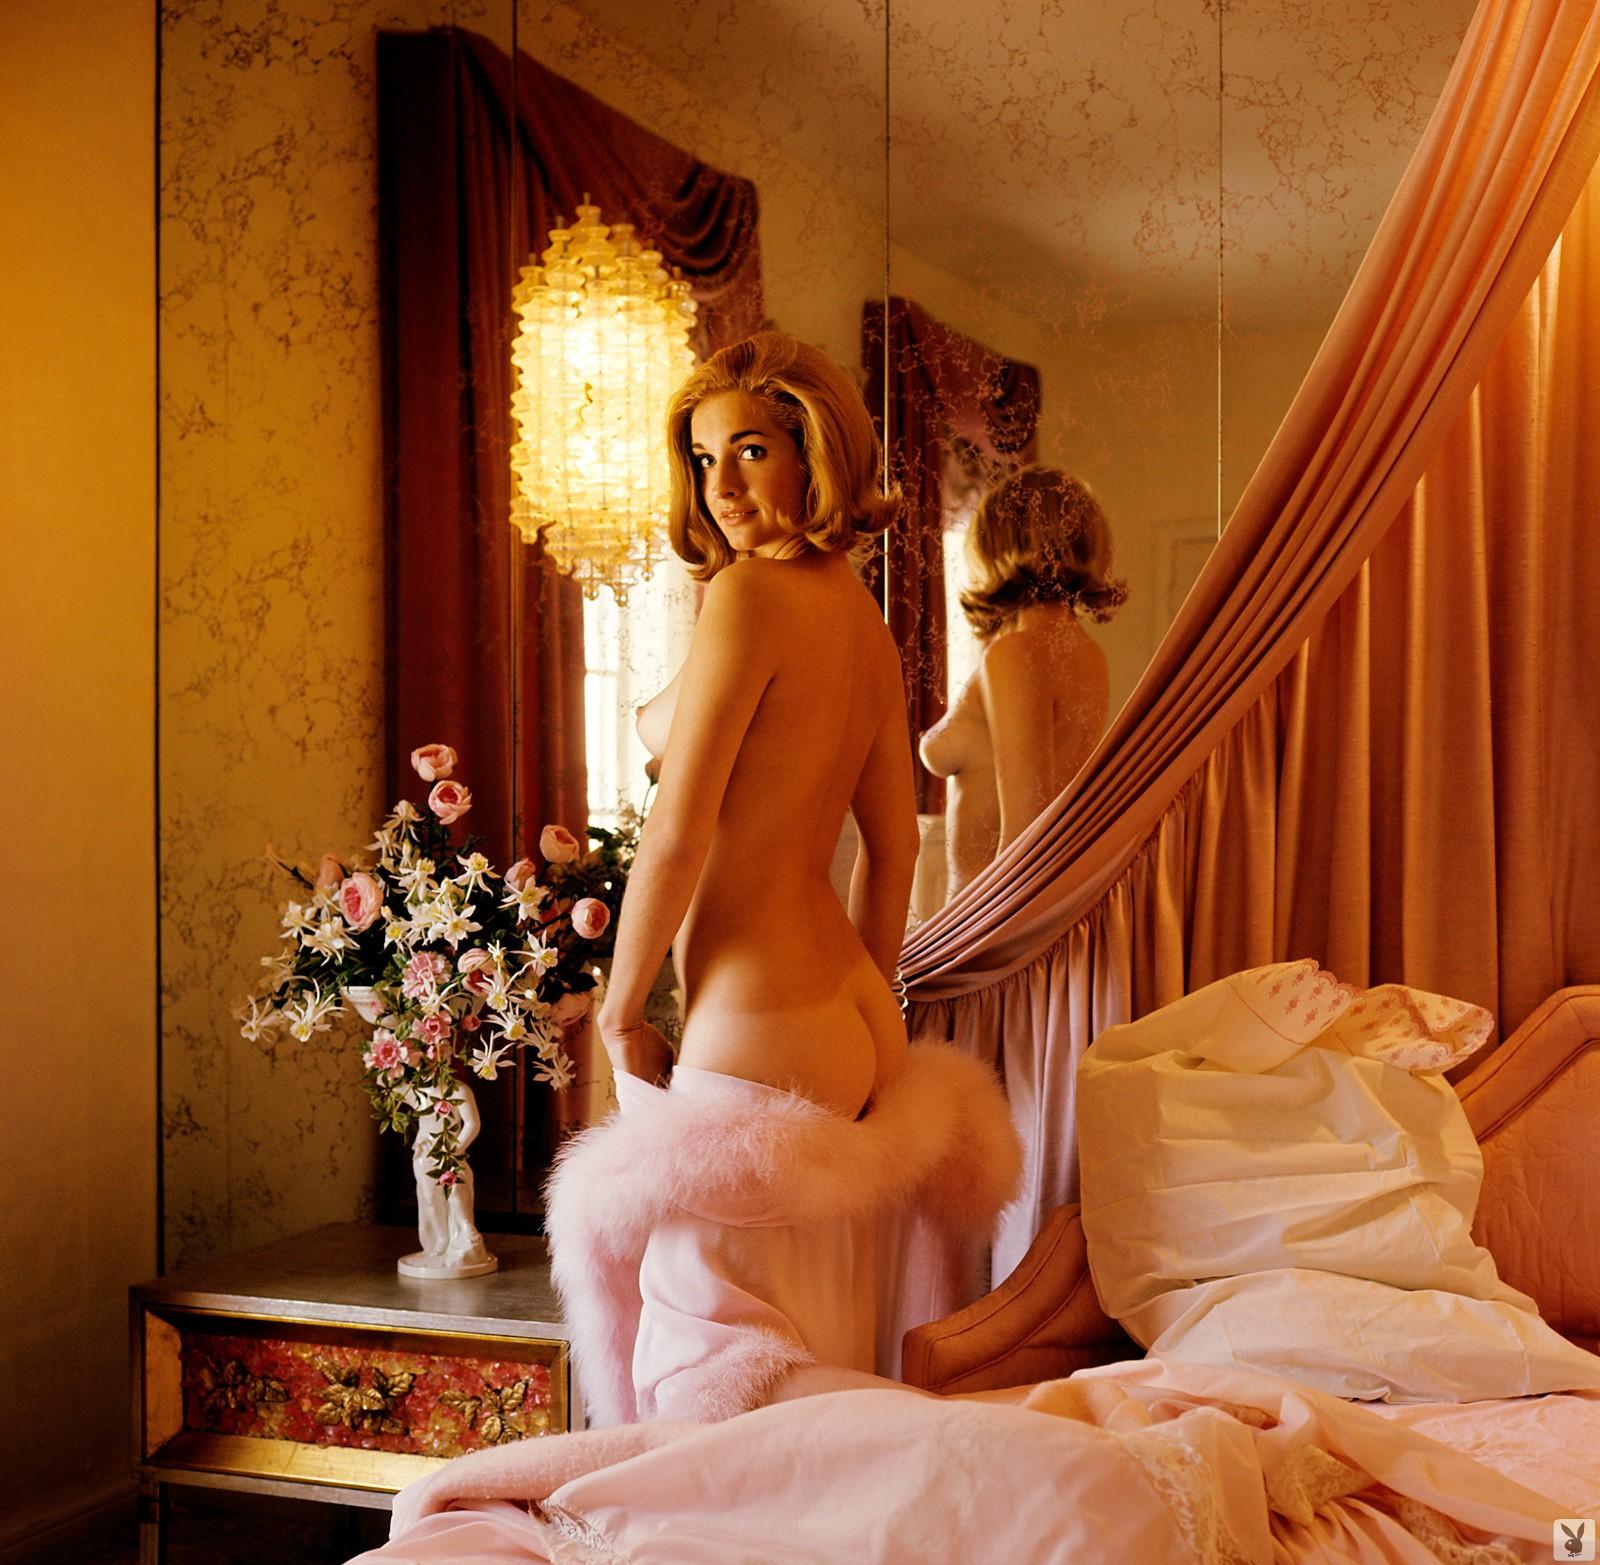 Girls nude pilgrim sexy